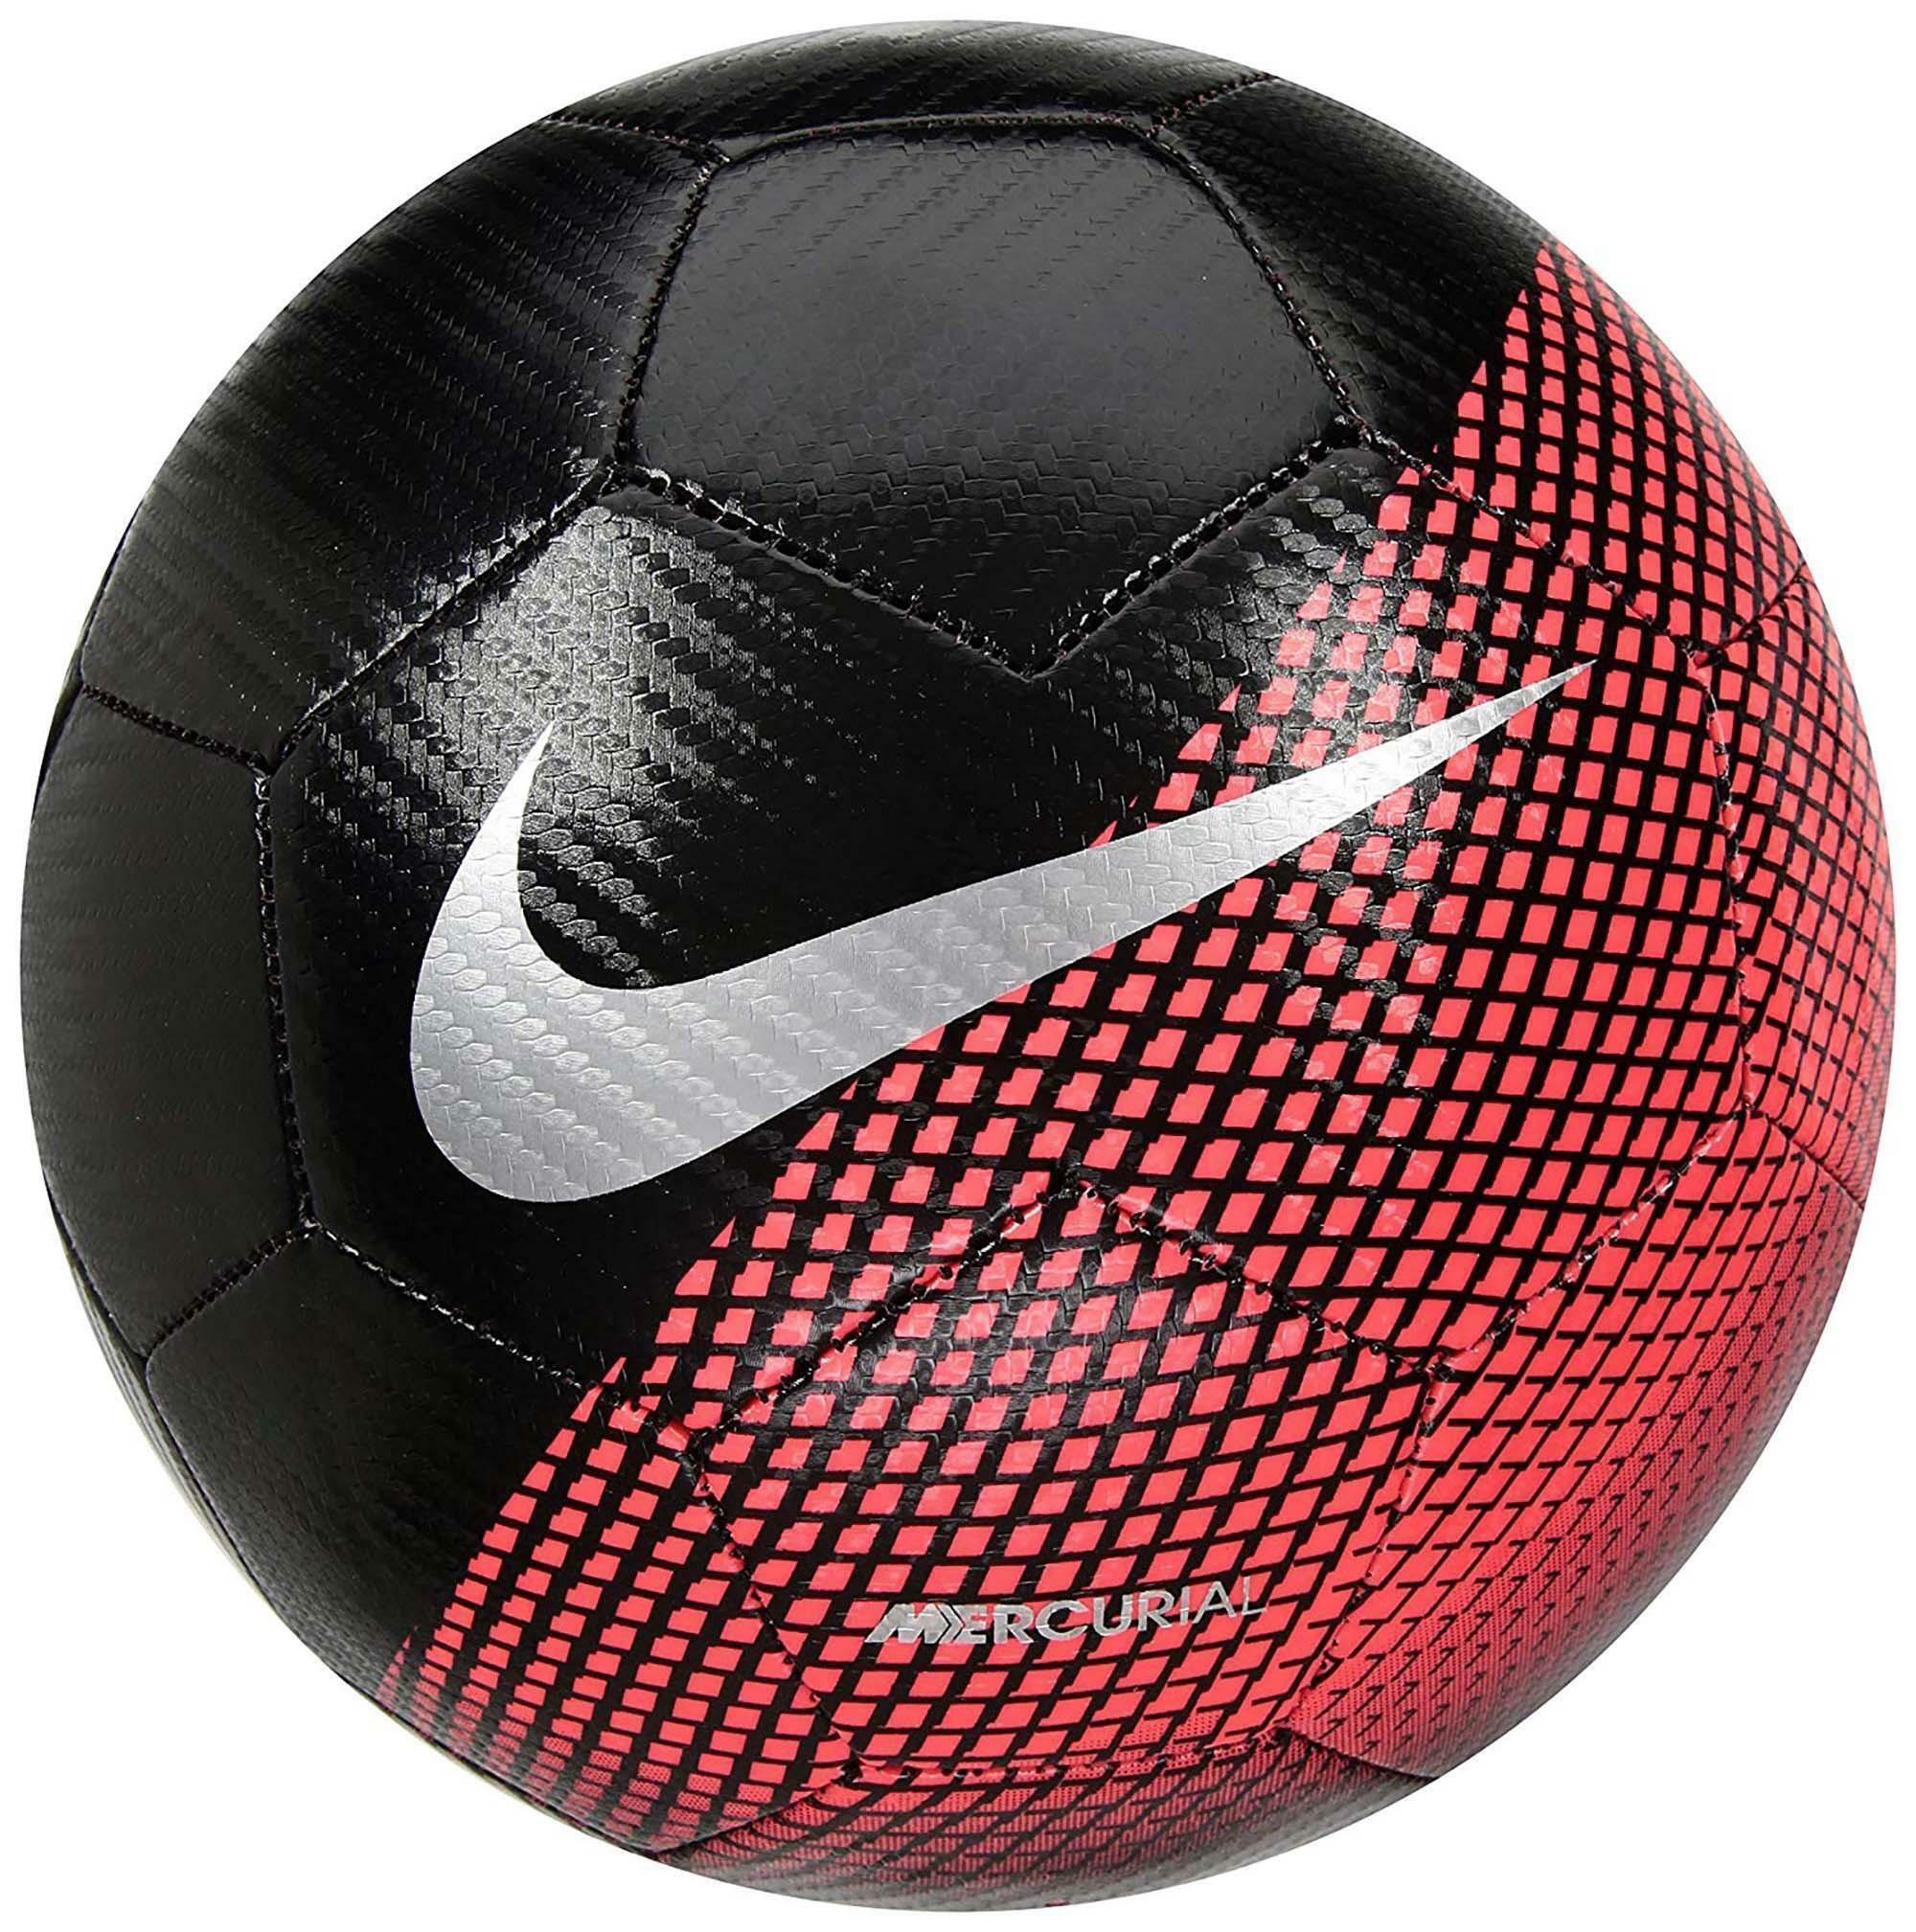 5 Rosso Nike Pallone Sc3370010 Nero Calcio N Cr7 rdWEQBeCxo